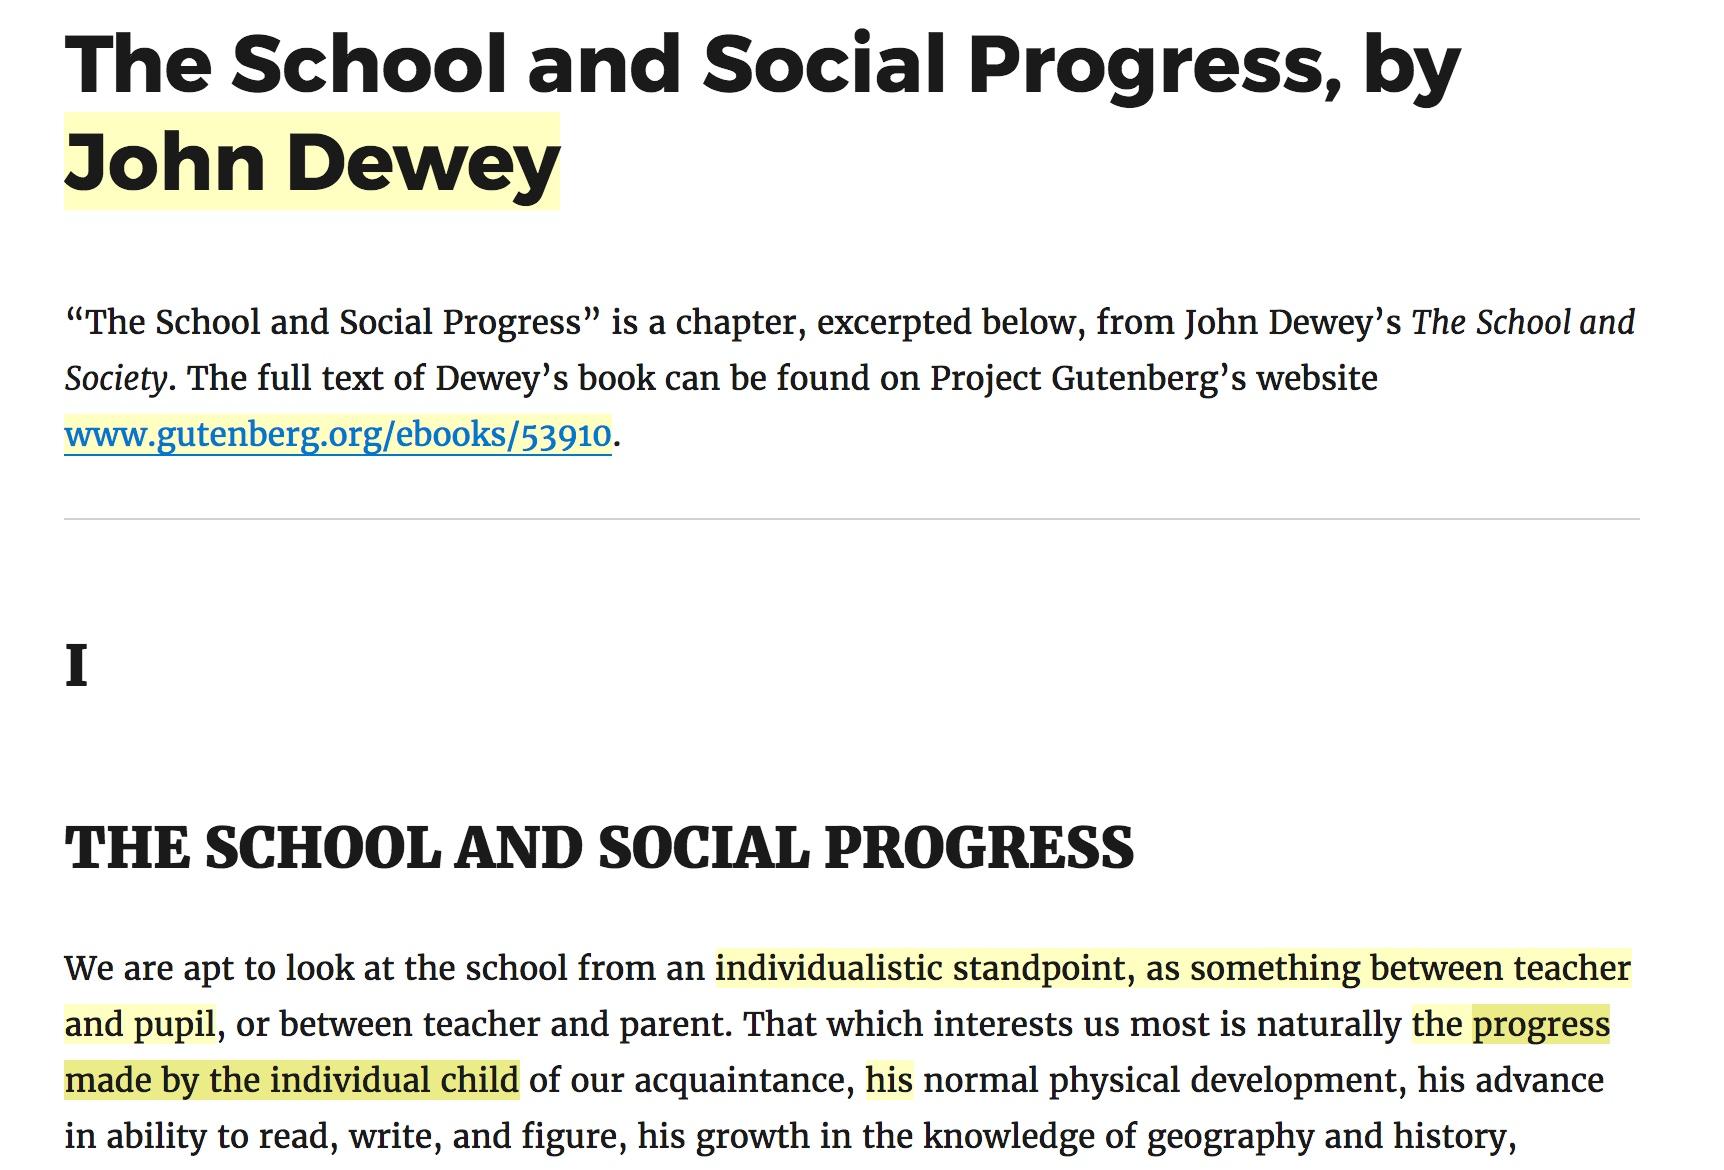 dewey school and society summary